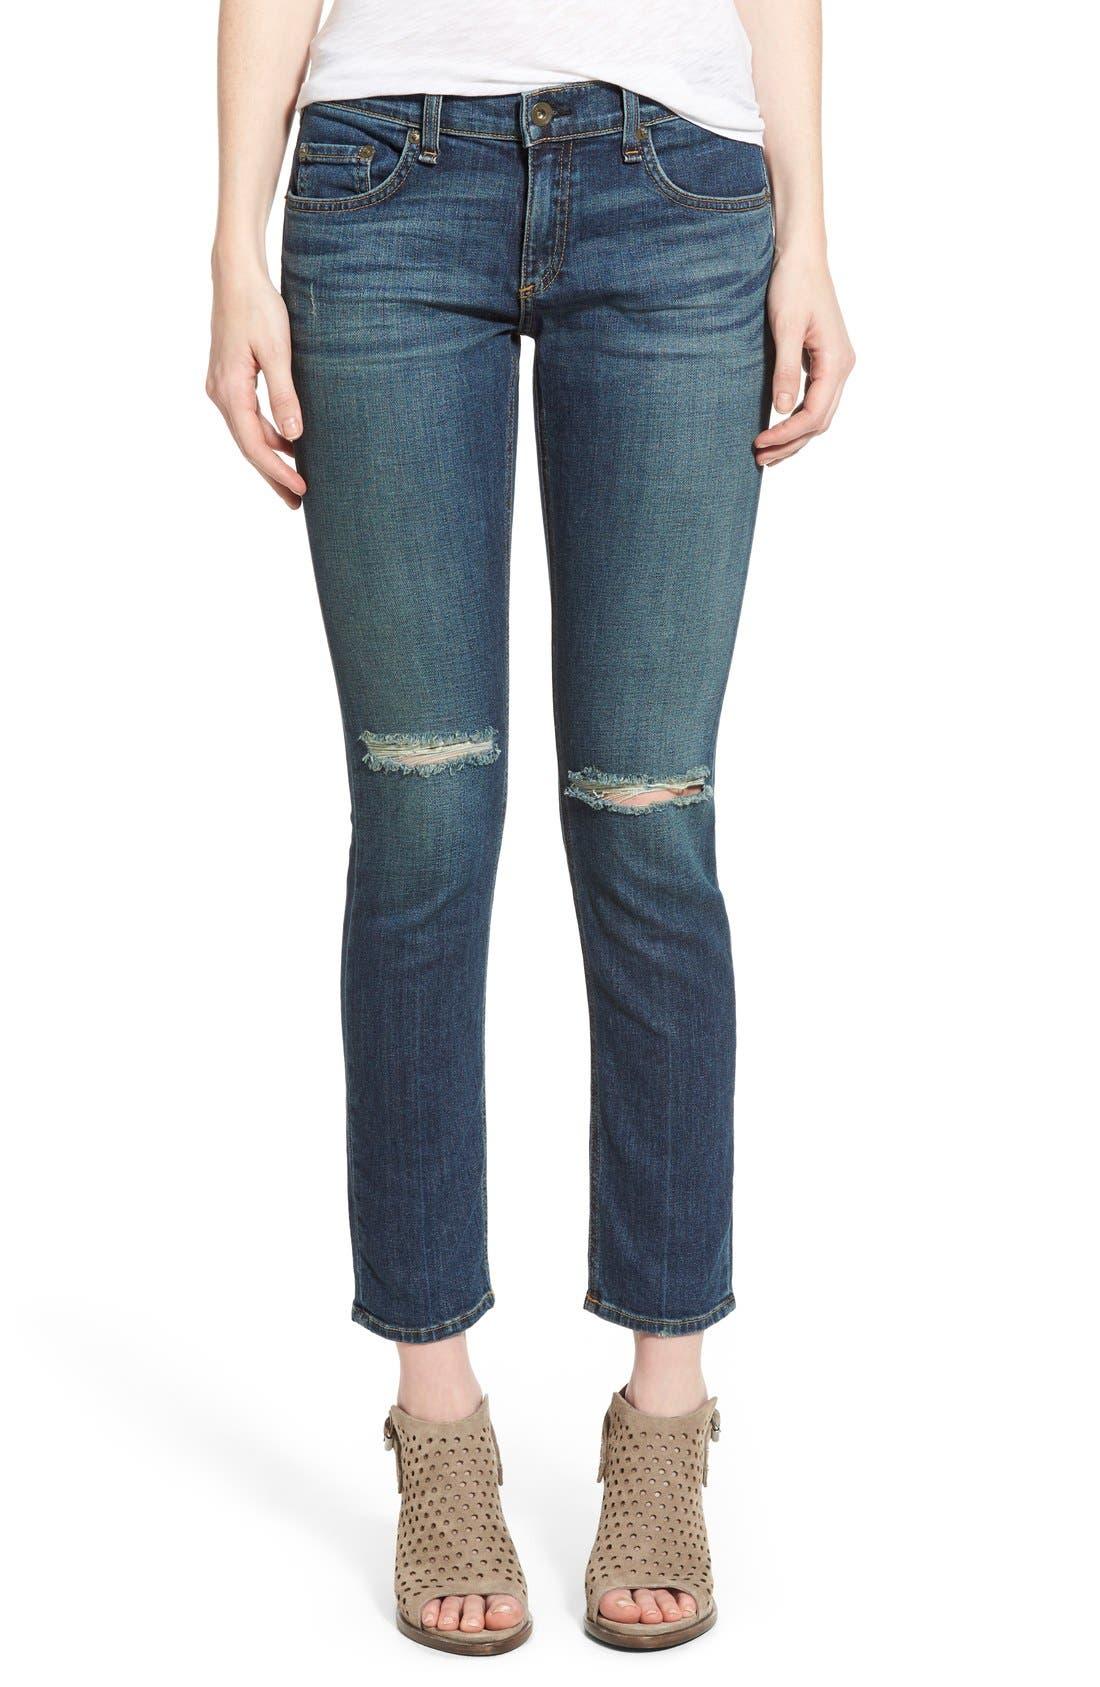 Main Image - rag & bone/JEAN 'Tomboy' Boyfriend Skinny Jeans (Burnley)